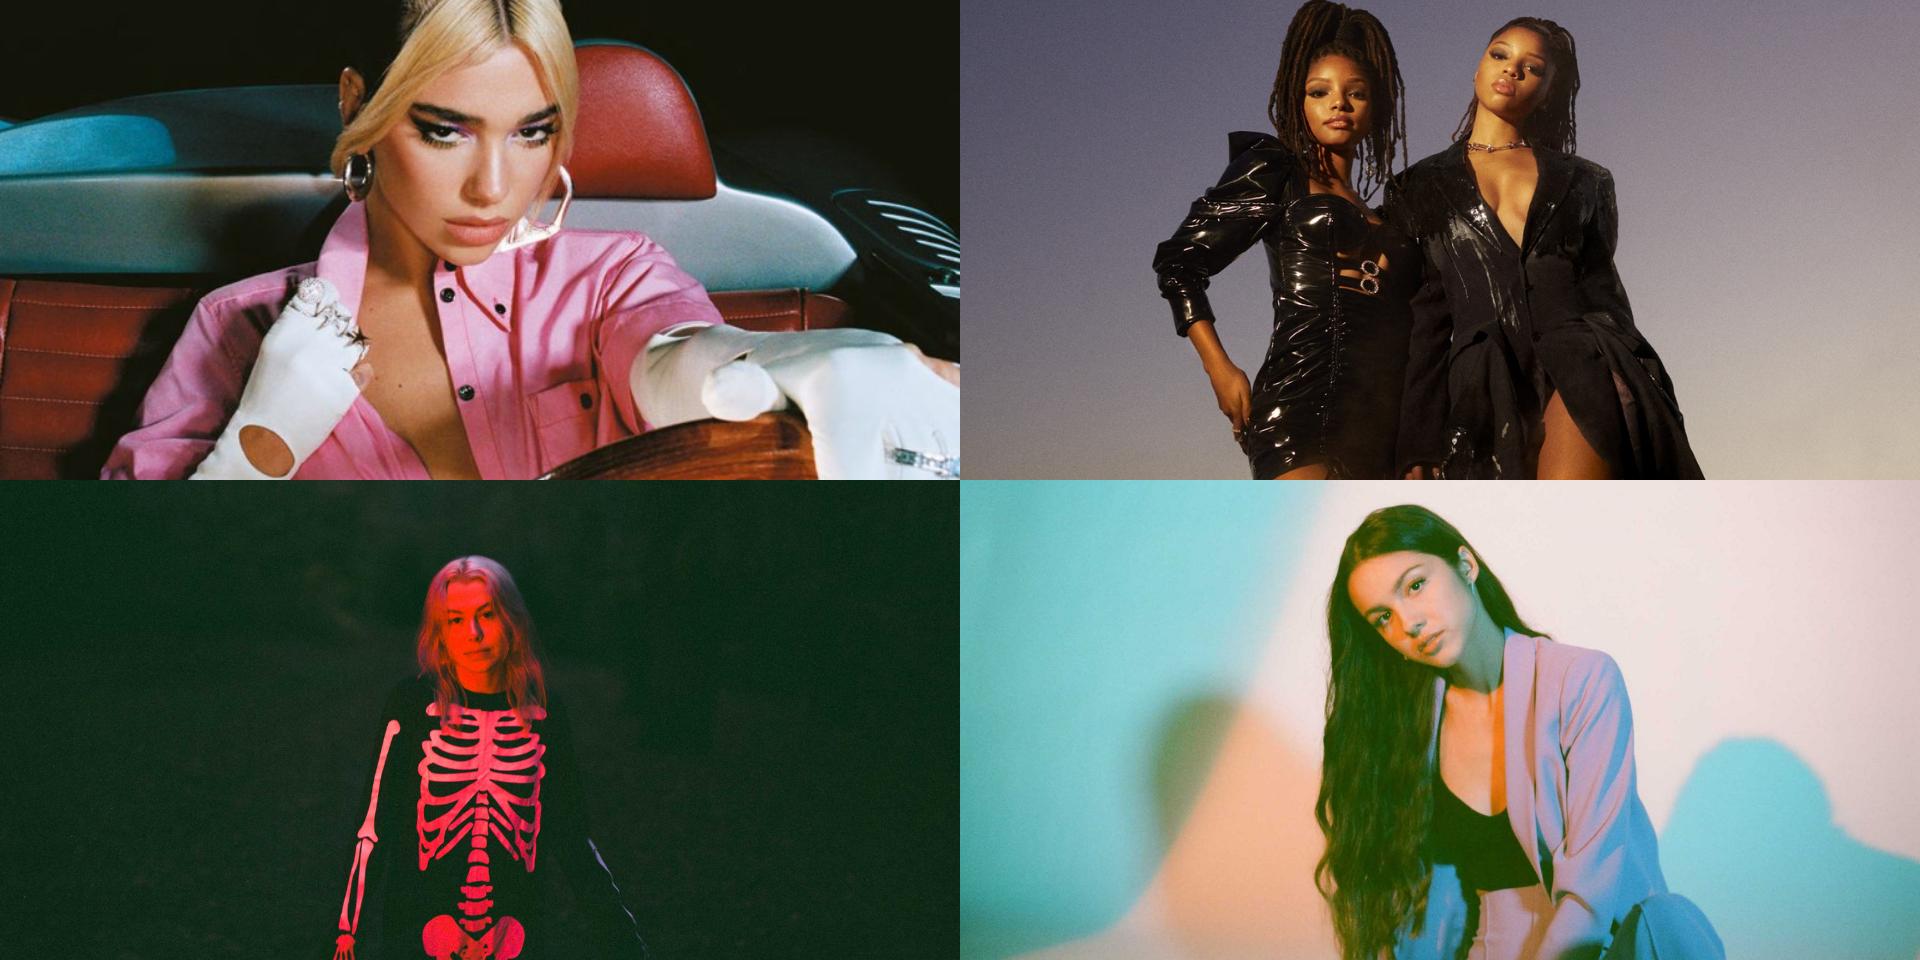 TIME reveals their next 100 people shaping the future – Dua Lipa, Phoebe Bridgers, Chloe x Halle, Olivia Rodrigo, and more